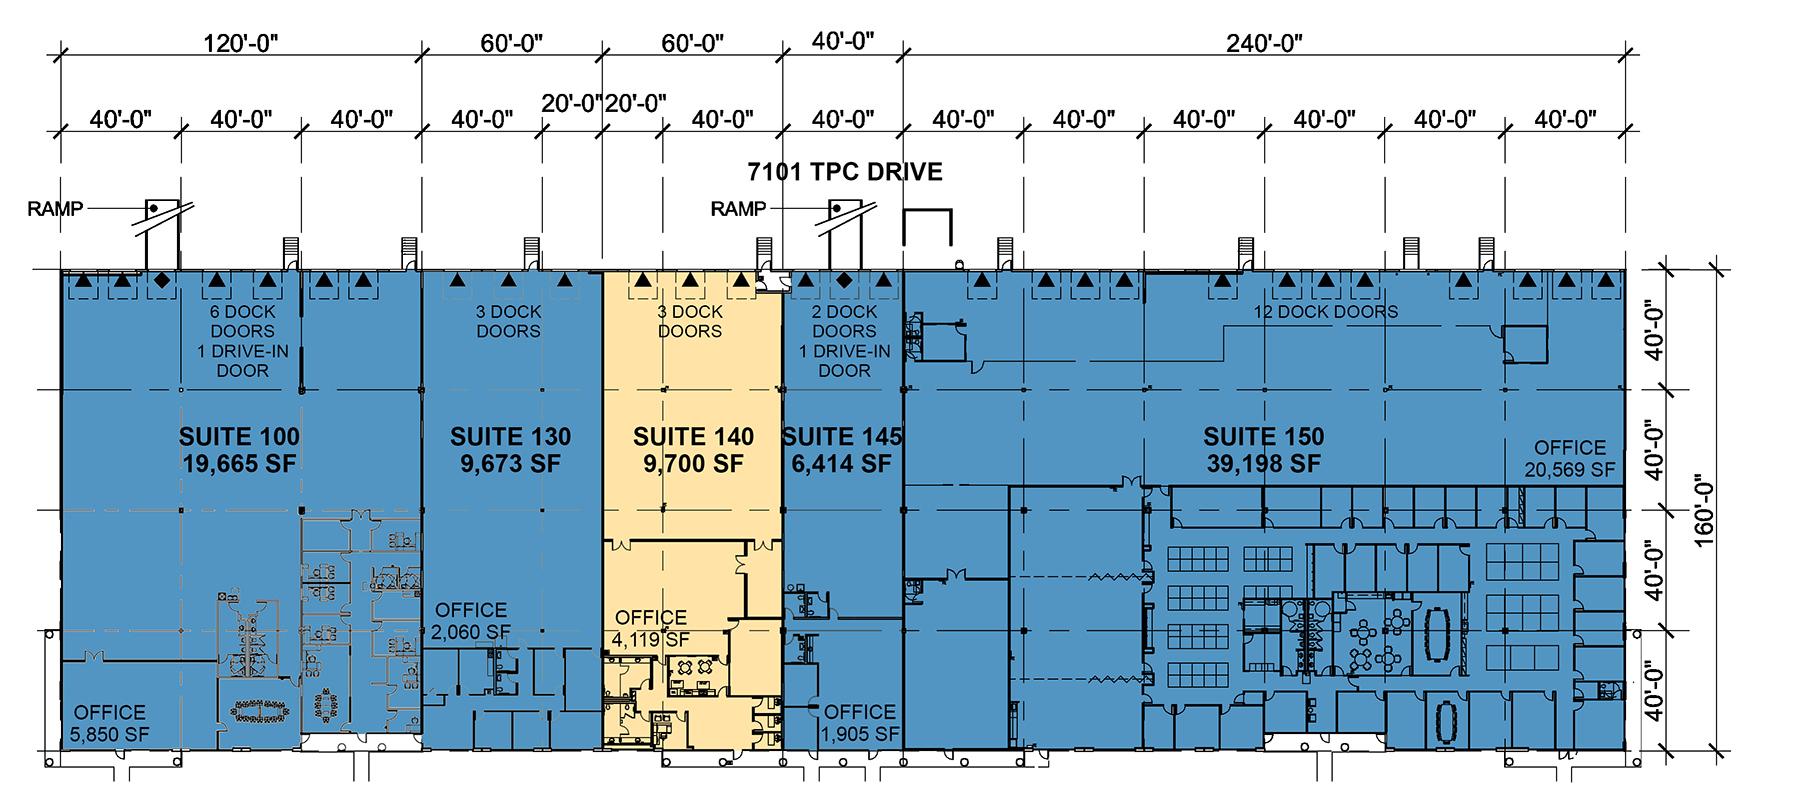 DPM-Prologis-Lee-Vista_7101-TPC-Dr_Flyer-Plan.jpg